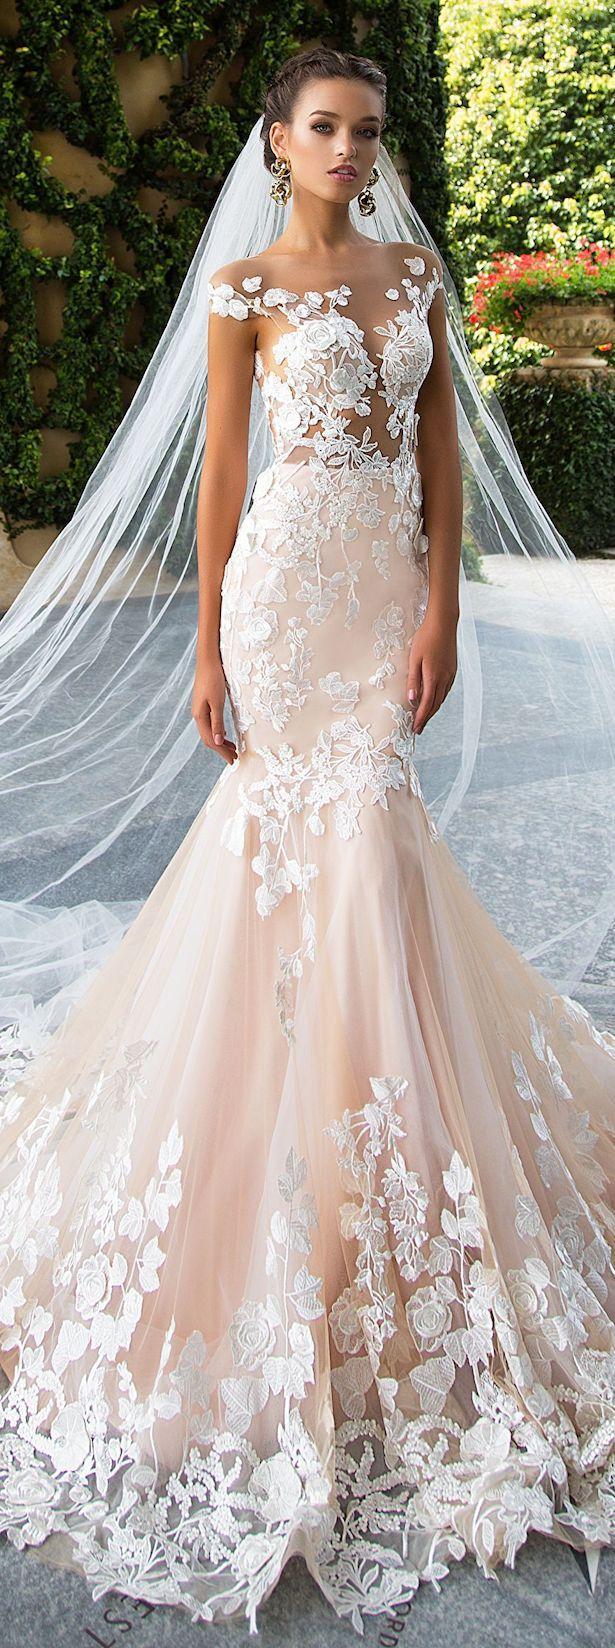 Wedding Dress By Milla Nova White Desire 2017 Bridal Collection